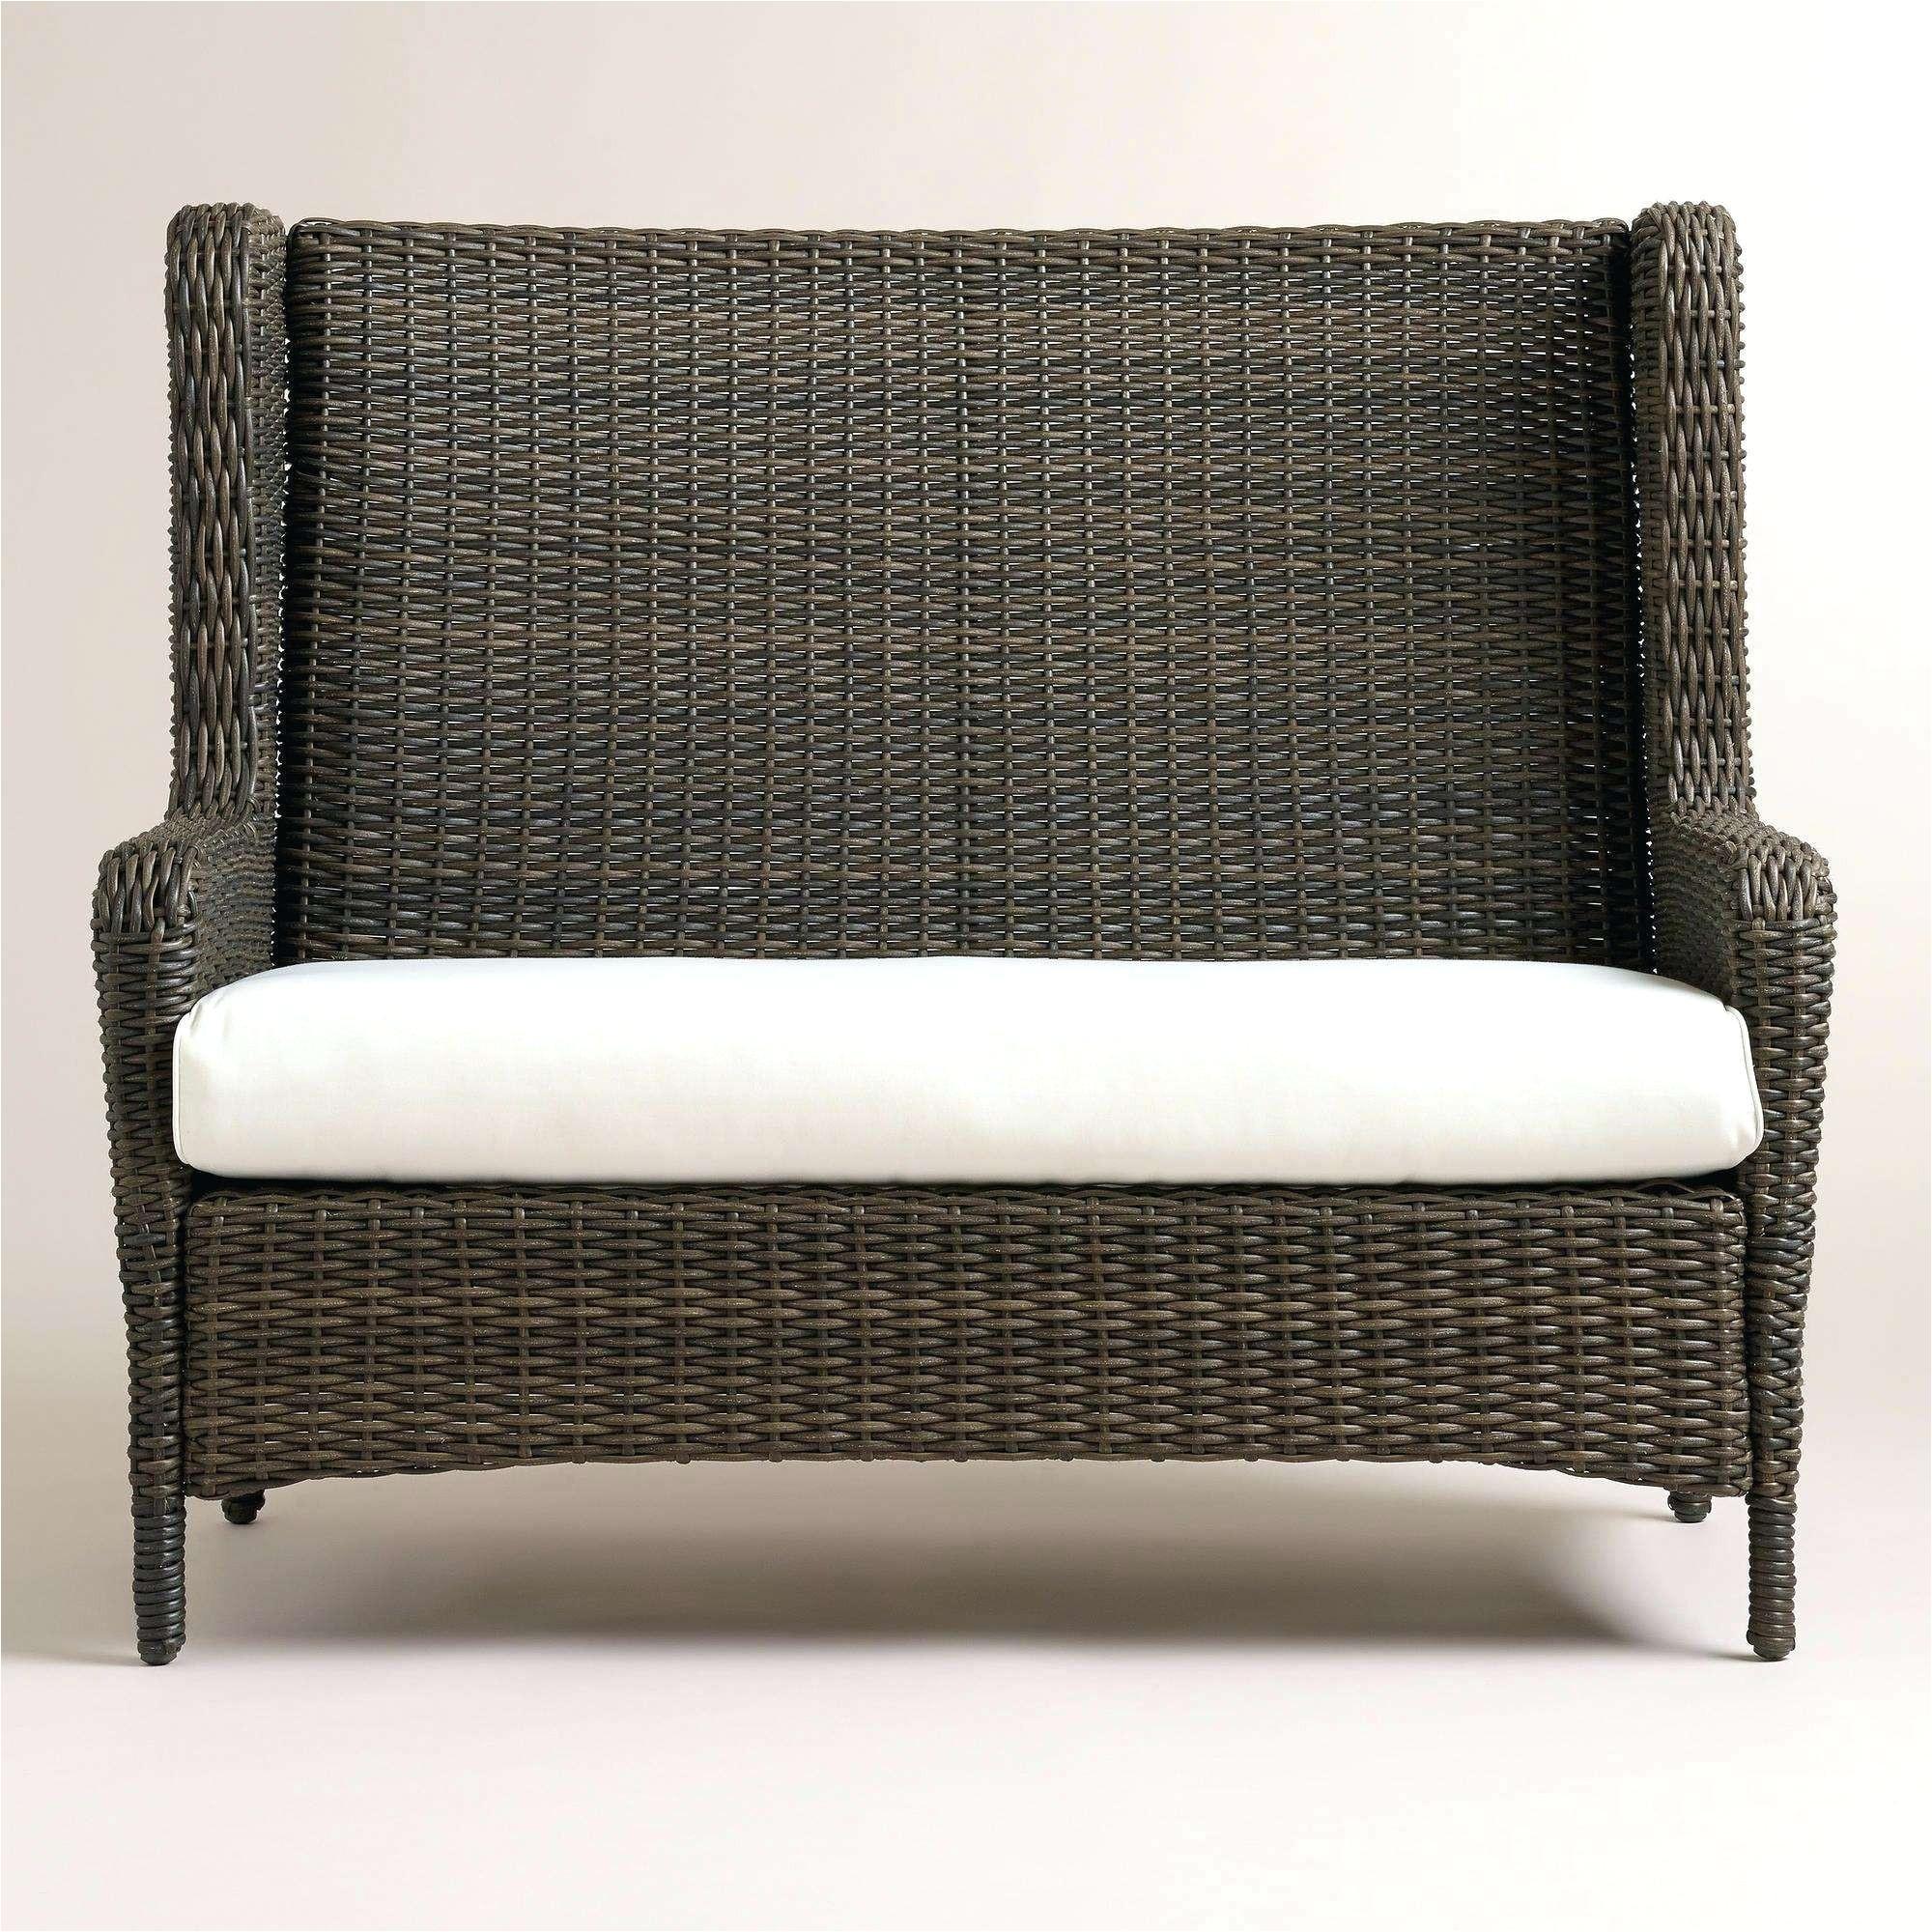 Kohls Rocking Chair Cushion Set 21 Inspirational Chair Seat Repair Car  Modification